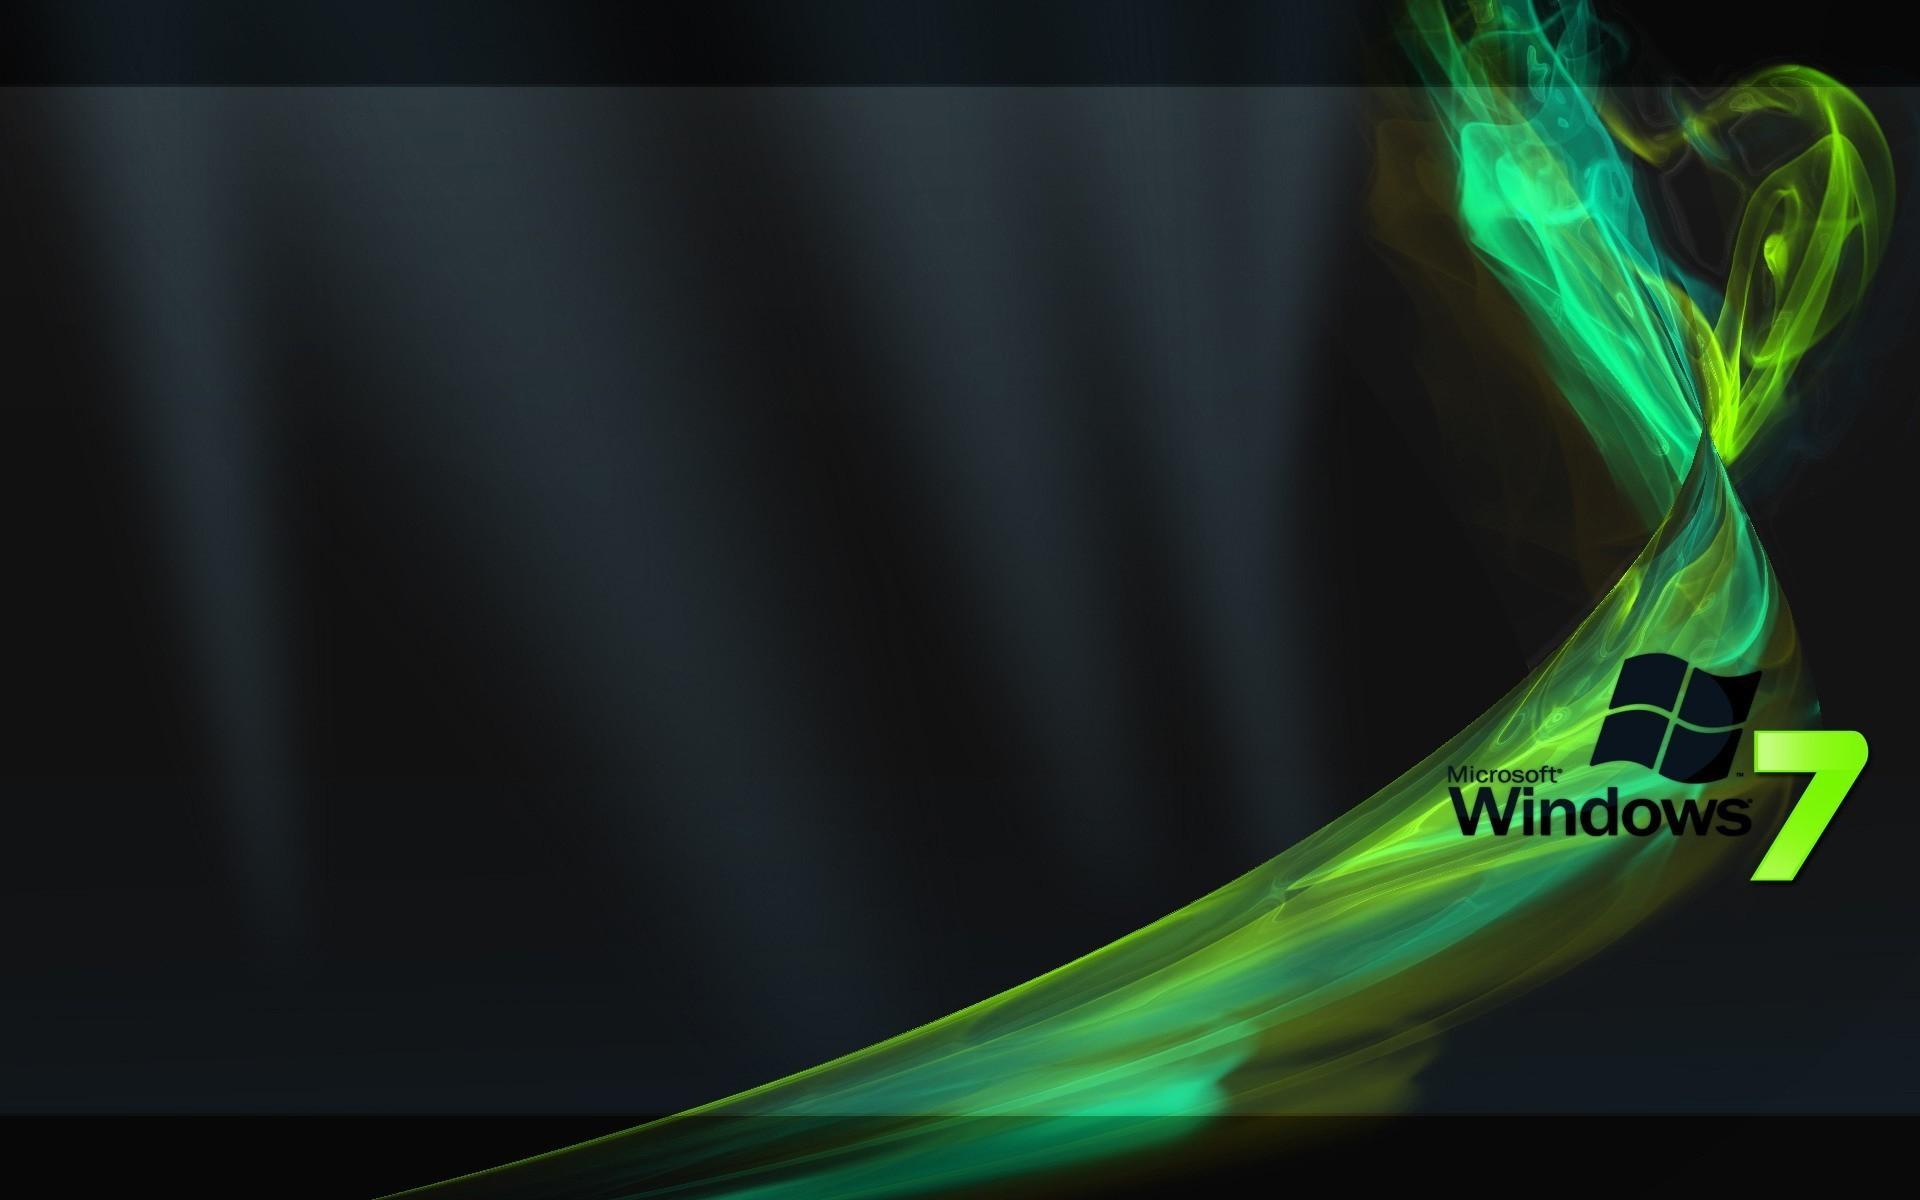 Microsoft desktop backgrounds windows 7 - Windows 7 love wallpapers ...